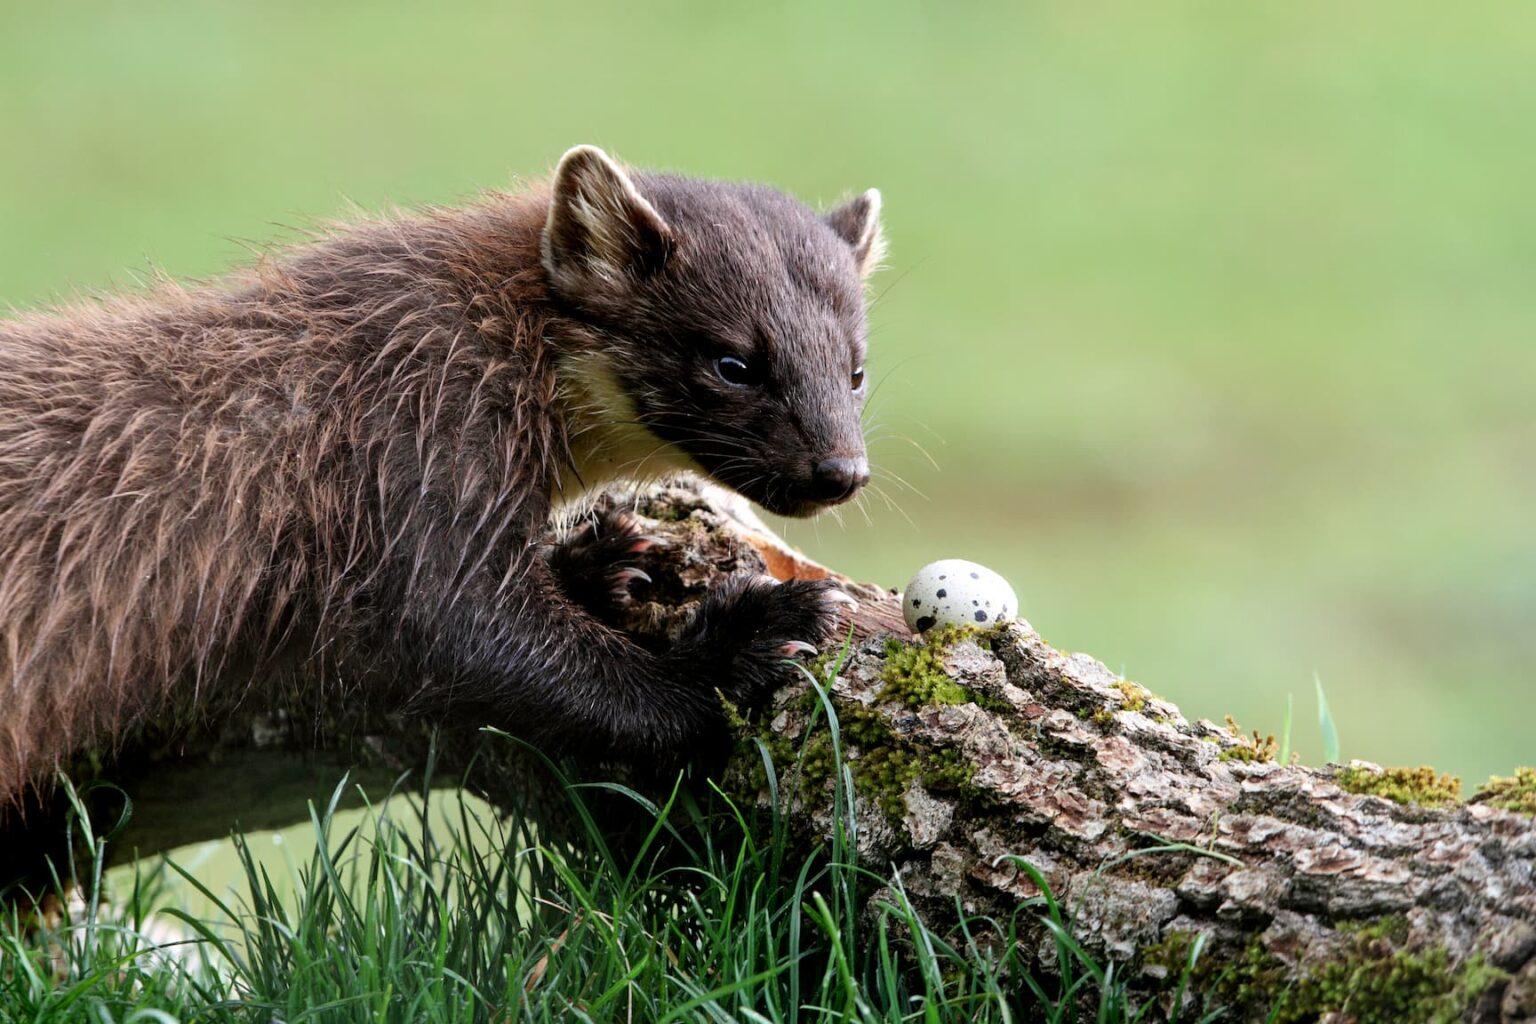 pine-marten-early-morning-martes-martes-vertebrates-marten-martes-mammals